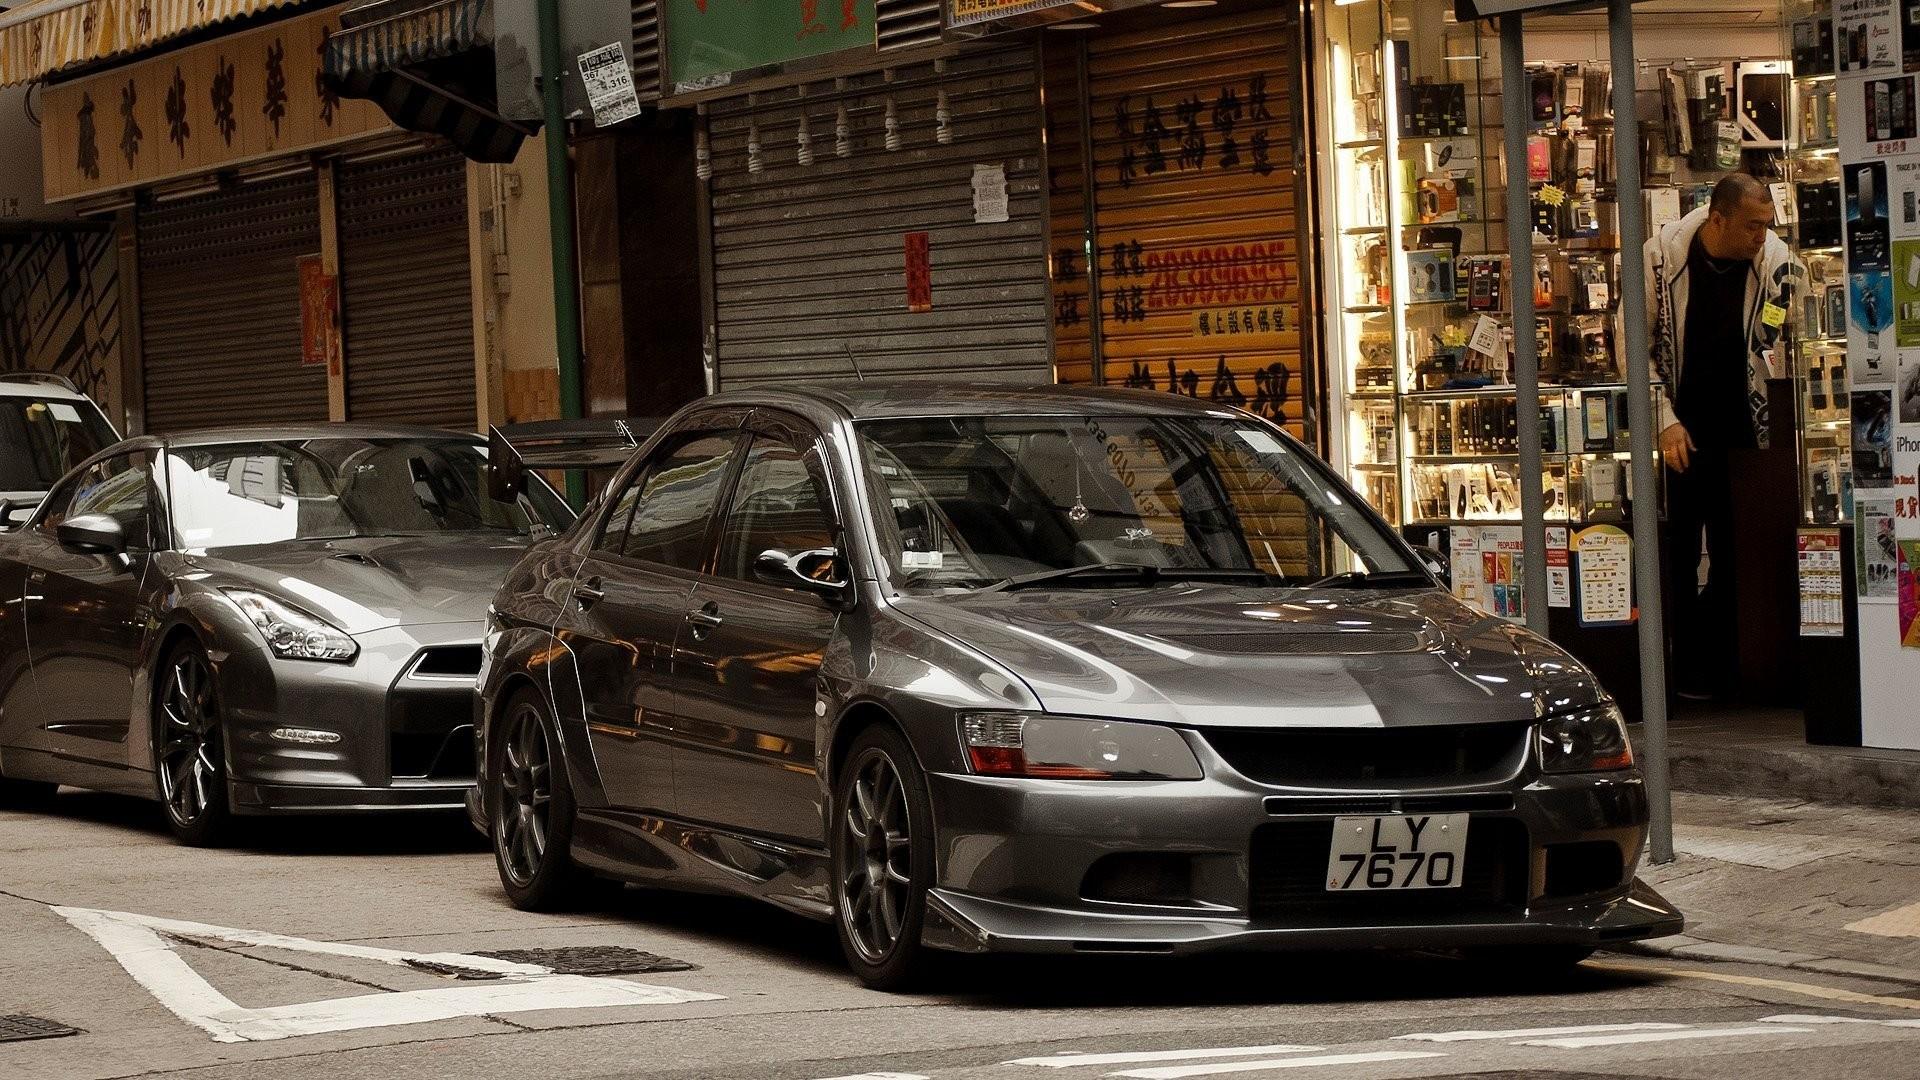 Mitsubishi Evo 8 Wallpaper (53+ images)